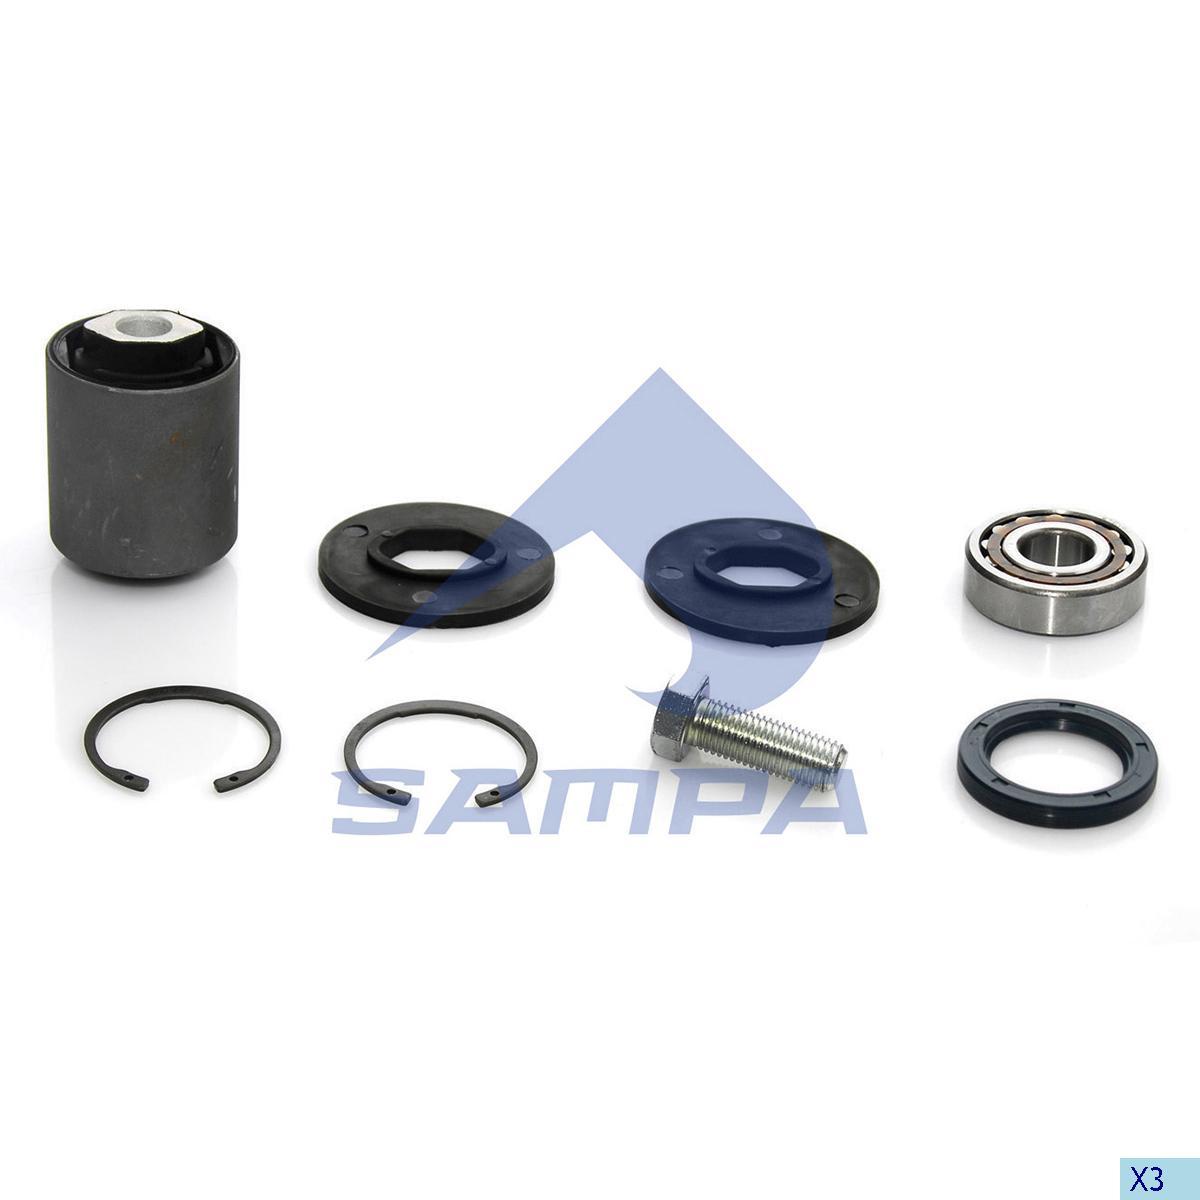 Repair Kit, Cab, Scania, Cab